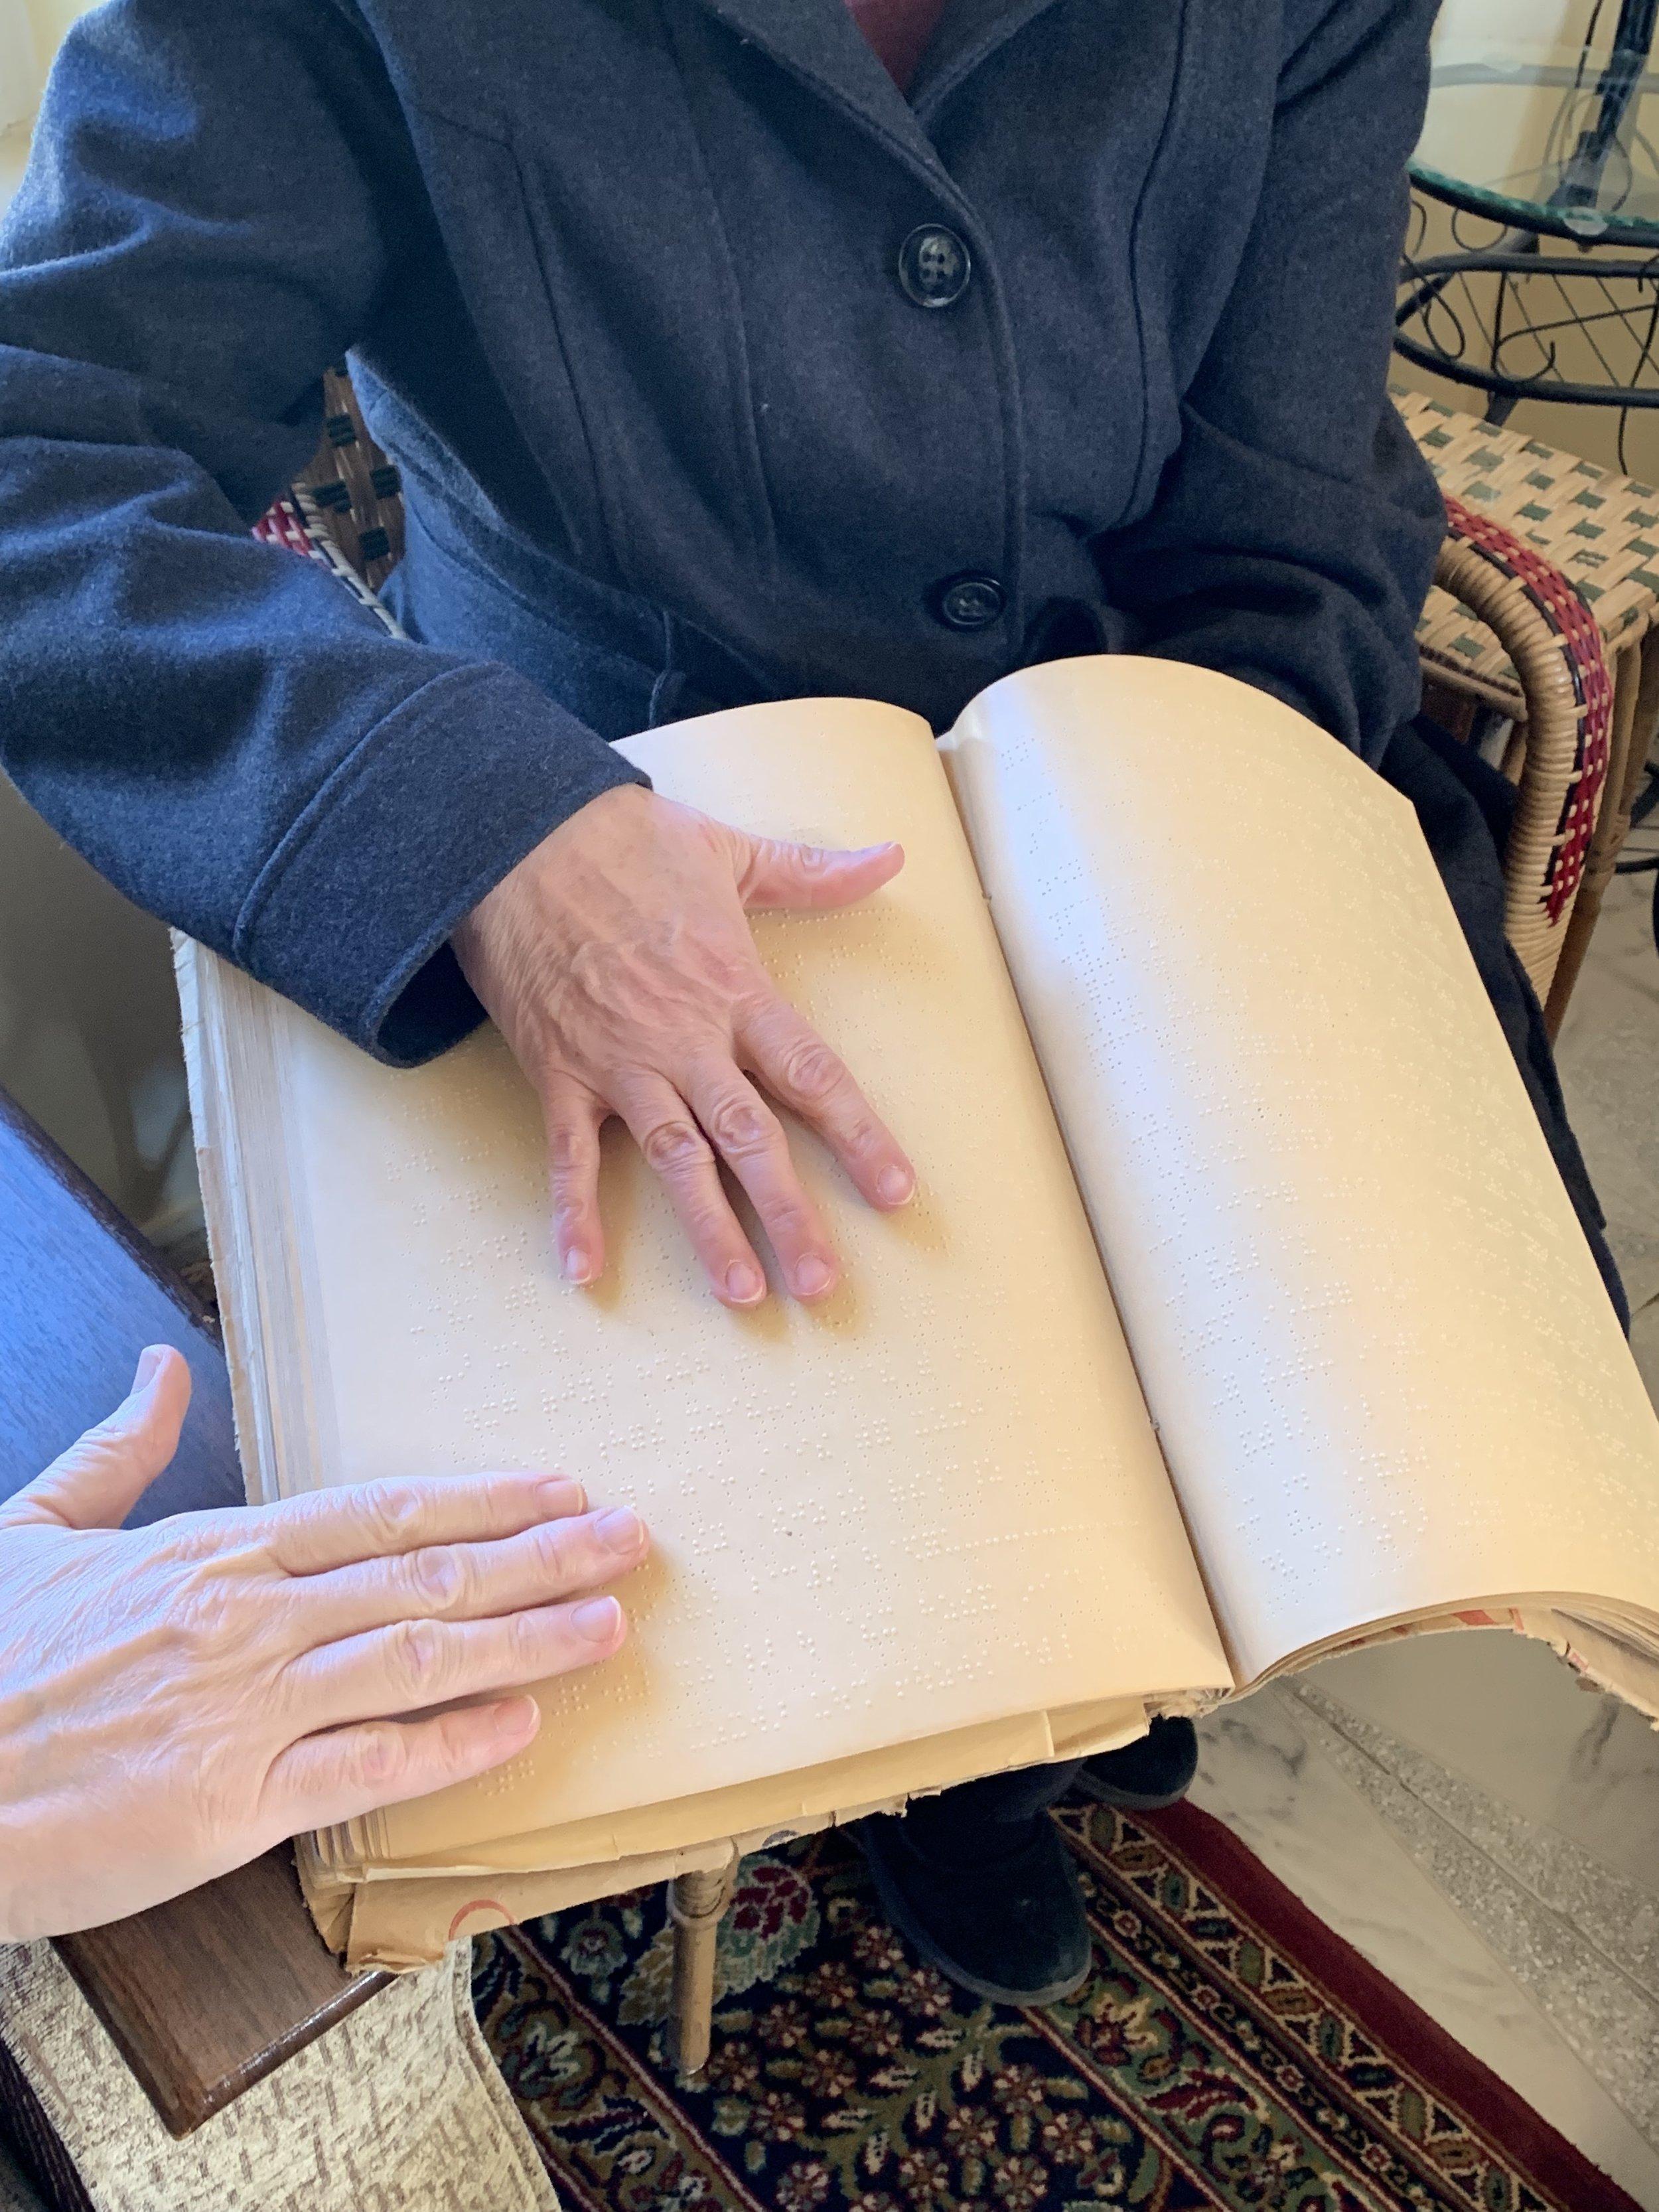 Feeling God's praises in an old Braille hymnbook